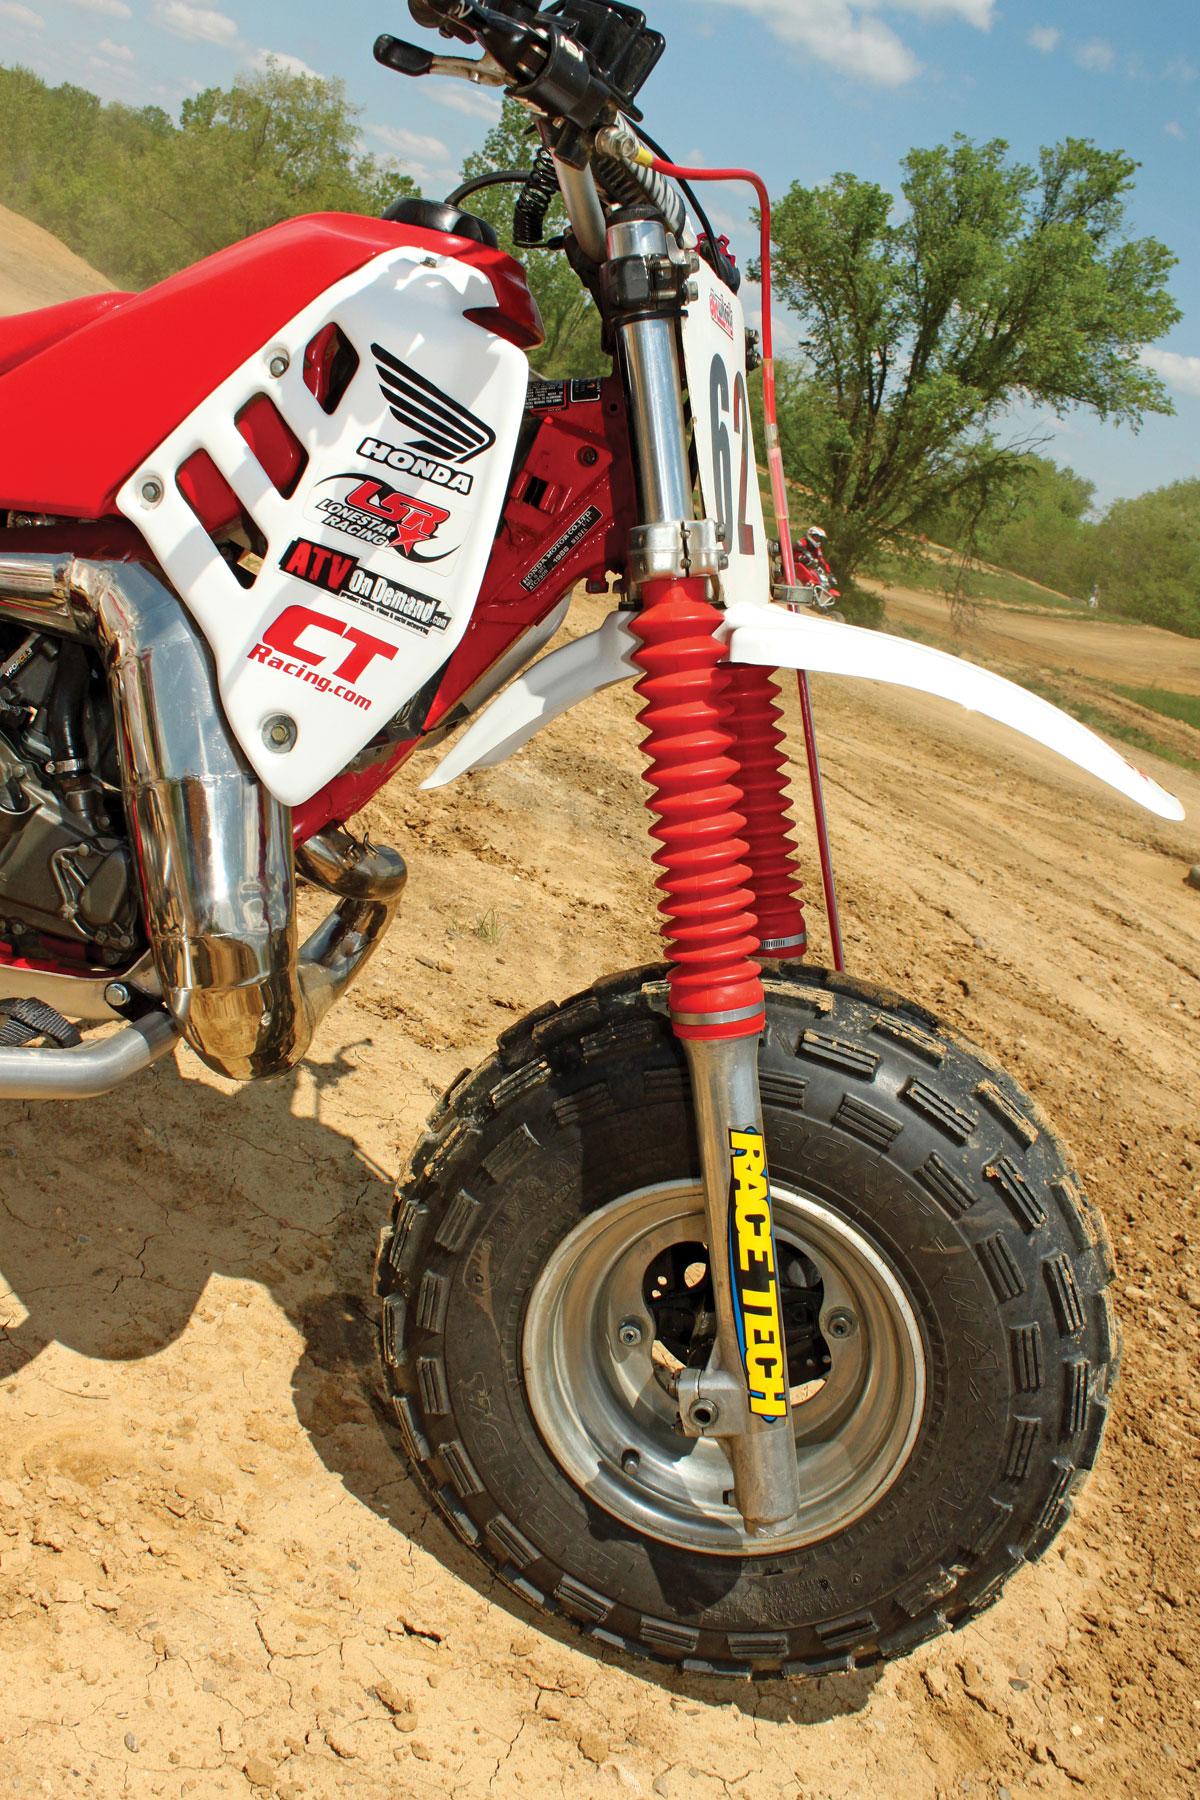 PROJECT ATV: Honda ATC250R | Dirt Wheels Magazine